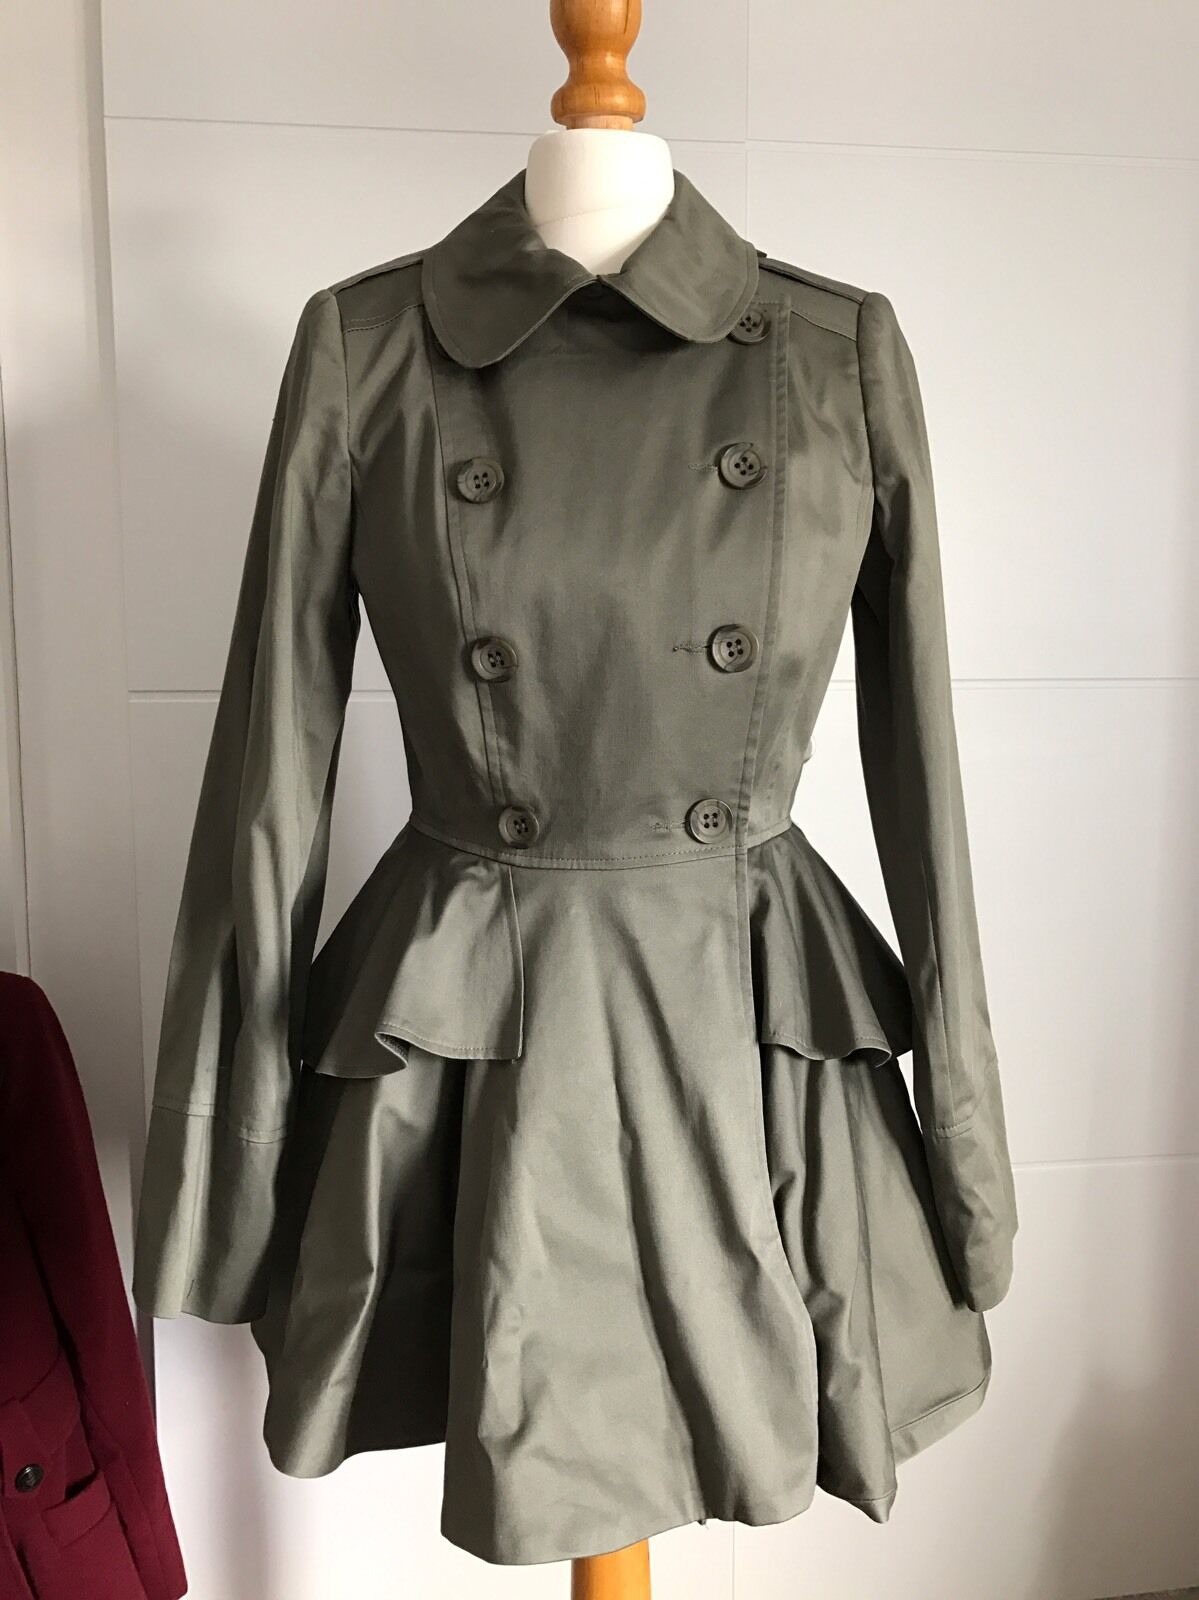 Lote  Miss Selfridge Peplum Mac chaqueta de  Color caqui Tamaño 6 hecho en Chelsea  entrega gratis